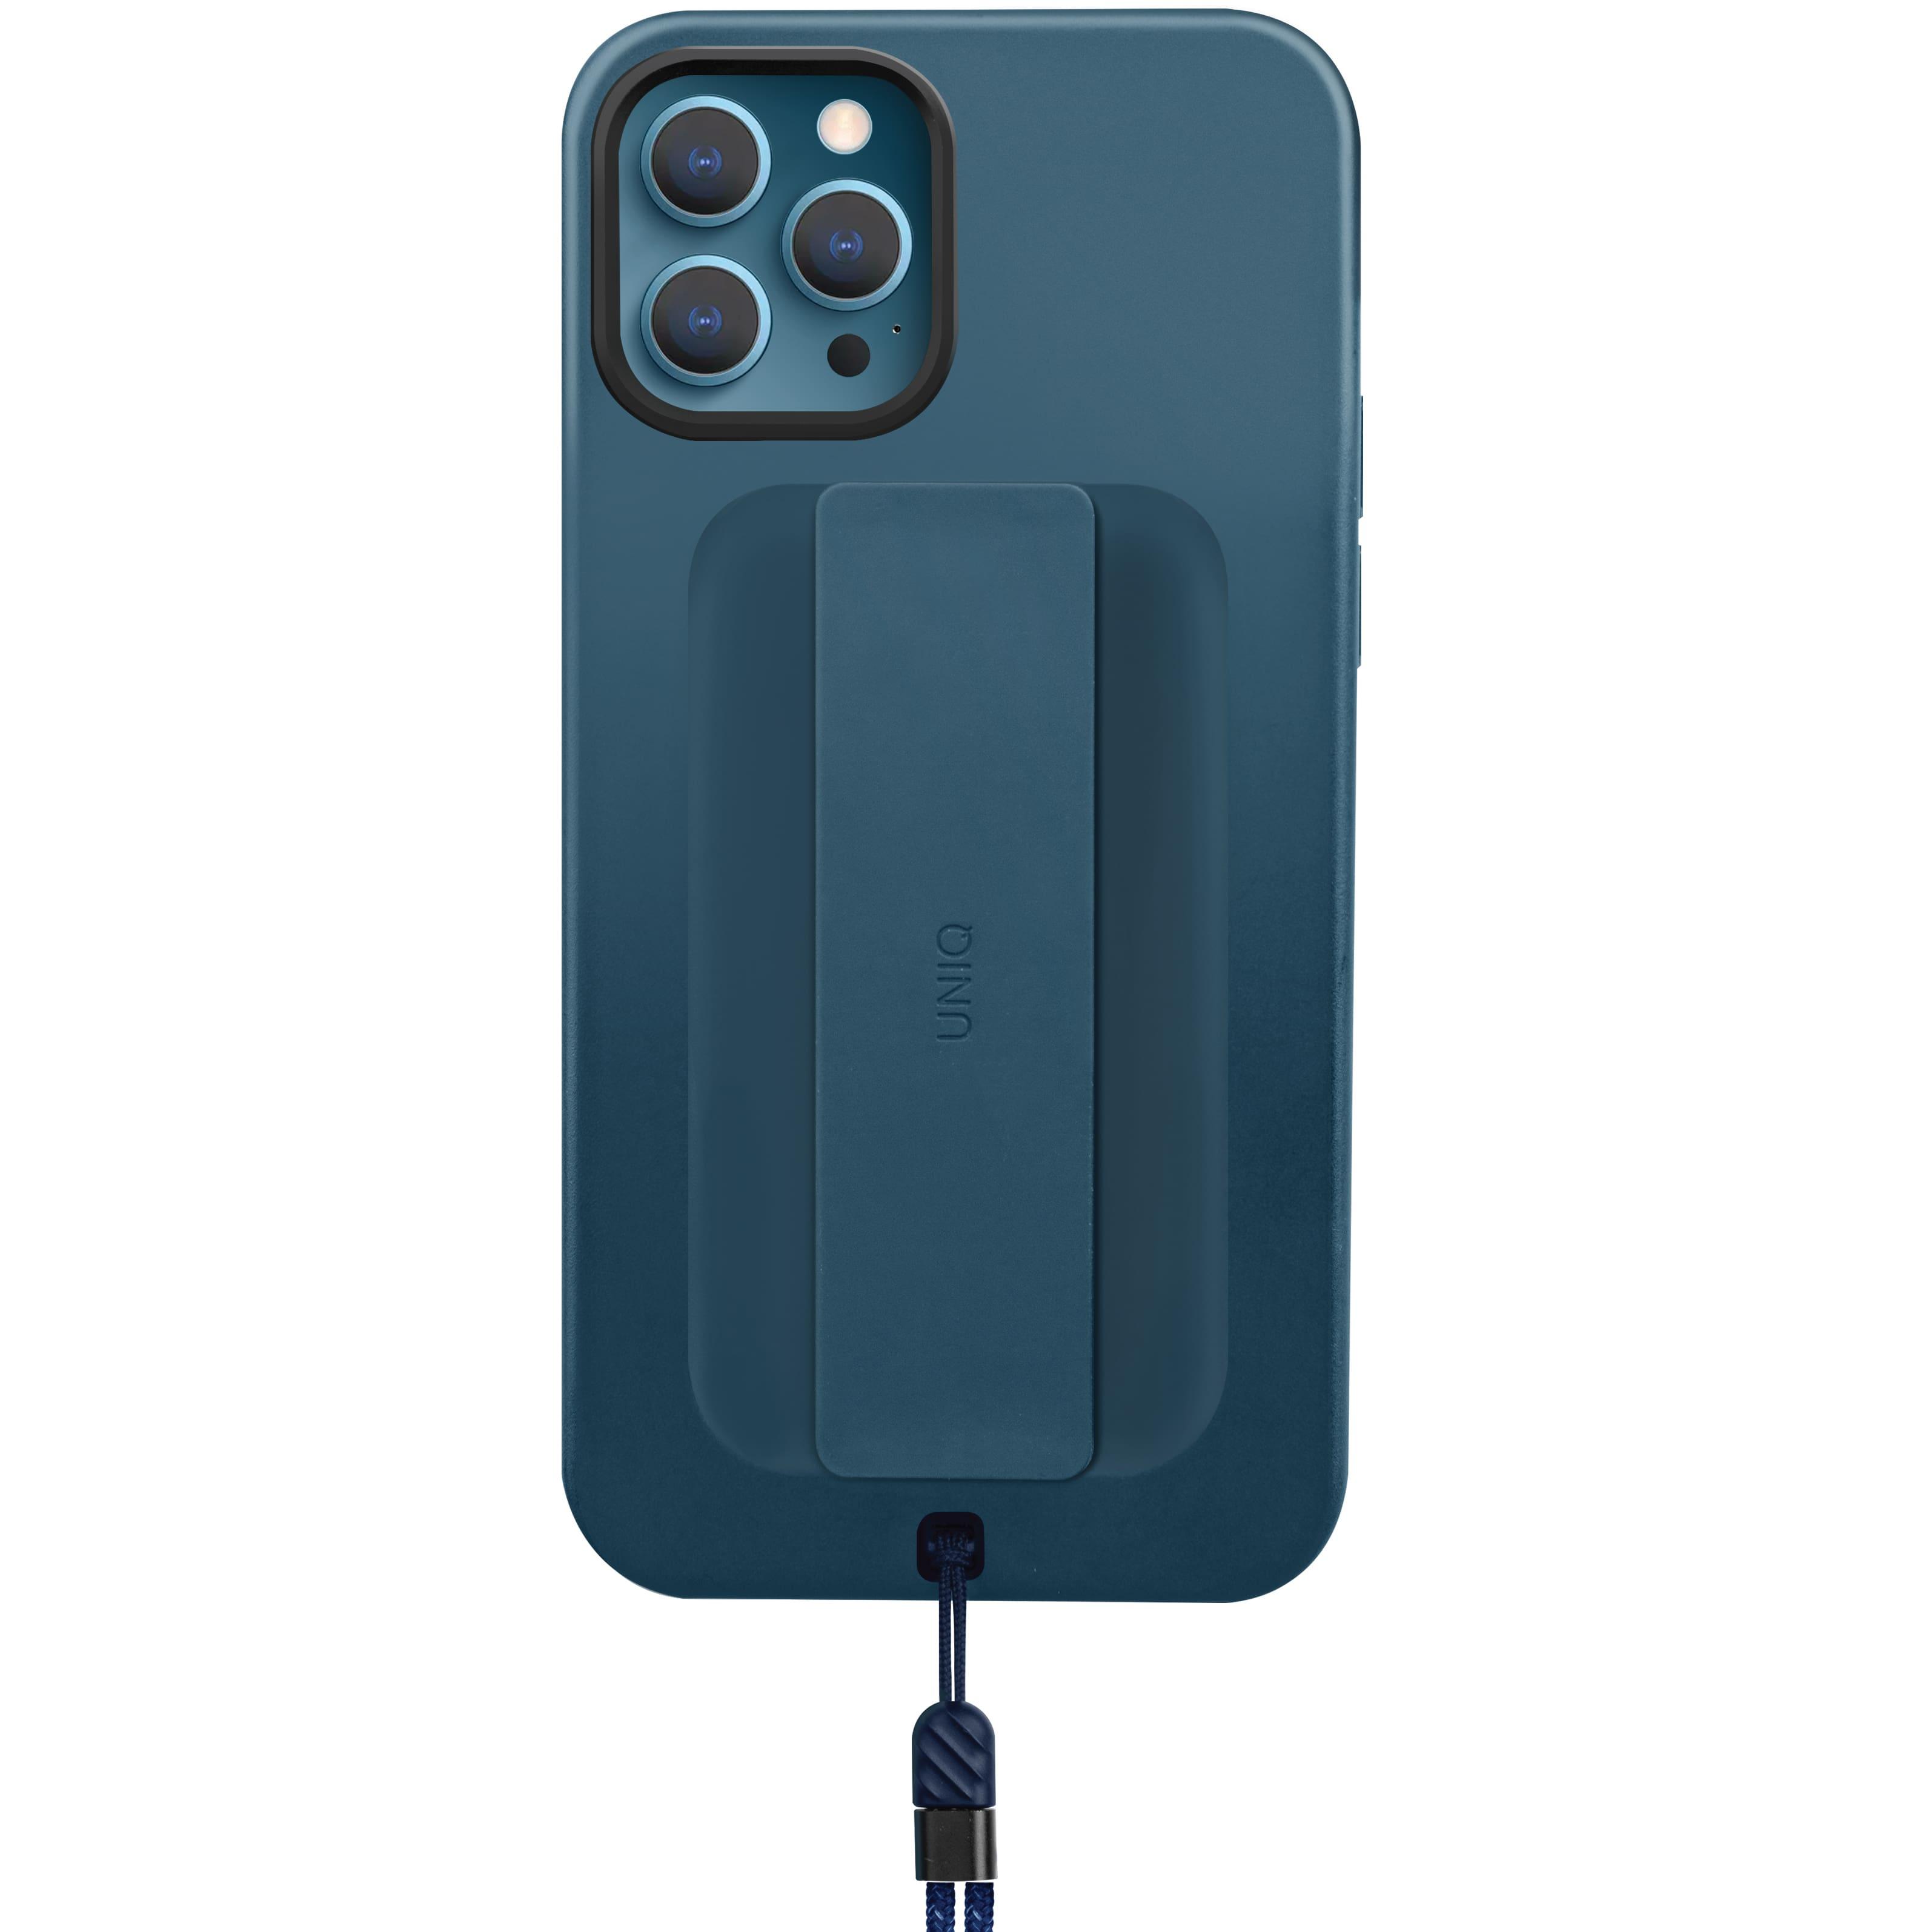 Ốp Lưng UNIQ Hybrid Iphone 12 Pro Max Heldro Antimicroblal